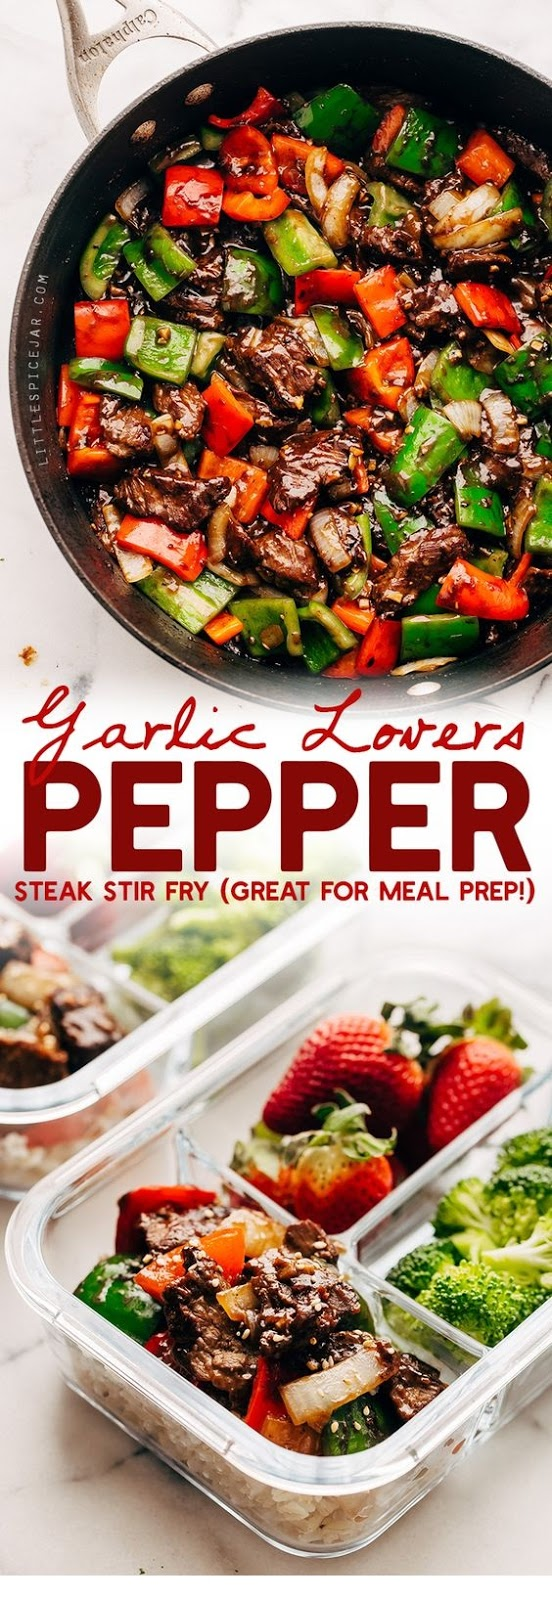 Garlic Lovers Pepper Steak Stir Fry